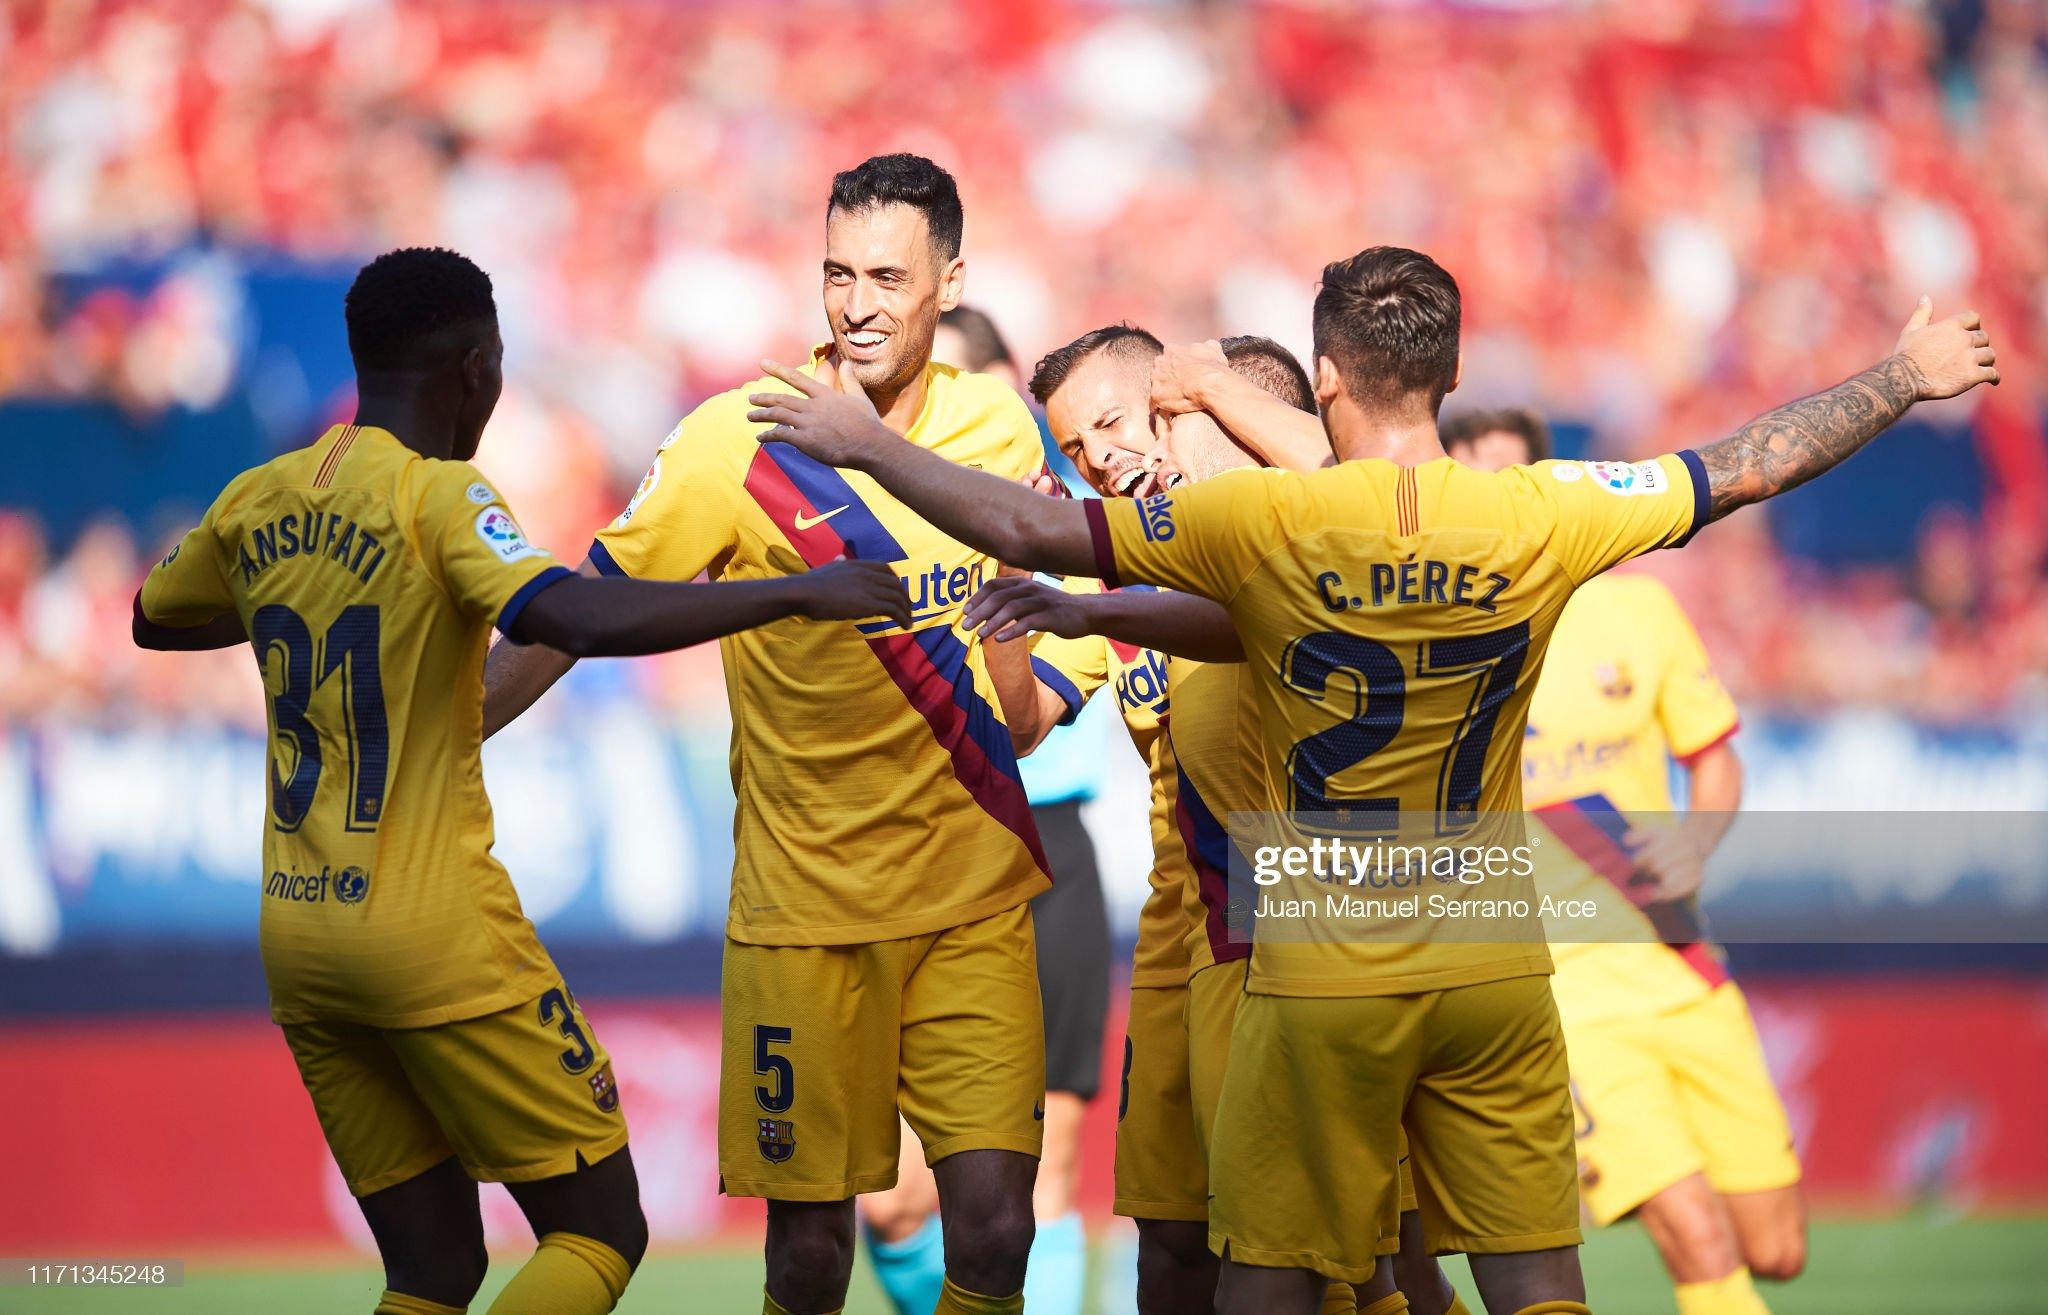 صور مباراة : أوساسونا - برشلونة 2-2 ( 31-08-2019 )  Arthur-melo-of-fc-barcelona-celebrates-with-teammates-after-scoring-picture-id1171345248?s=2048x2048